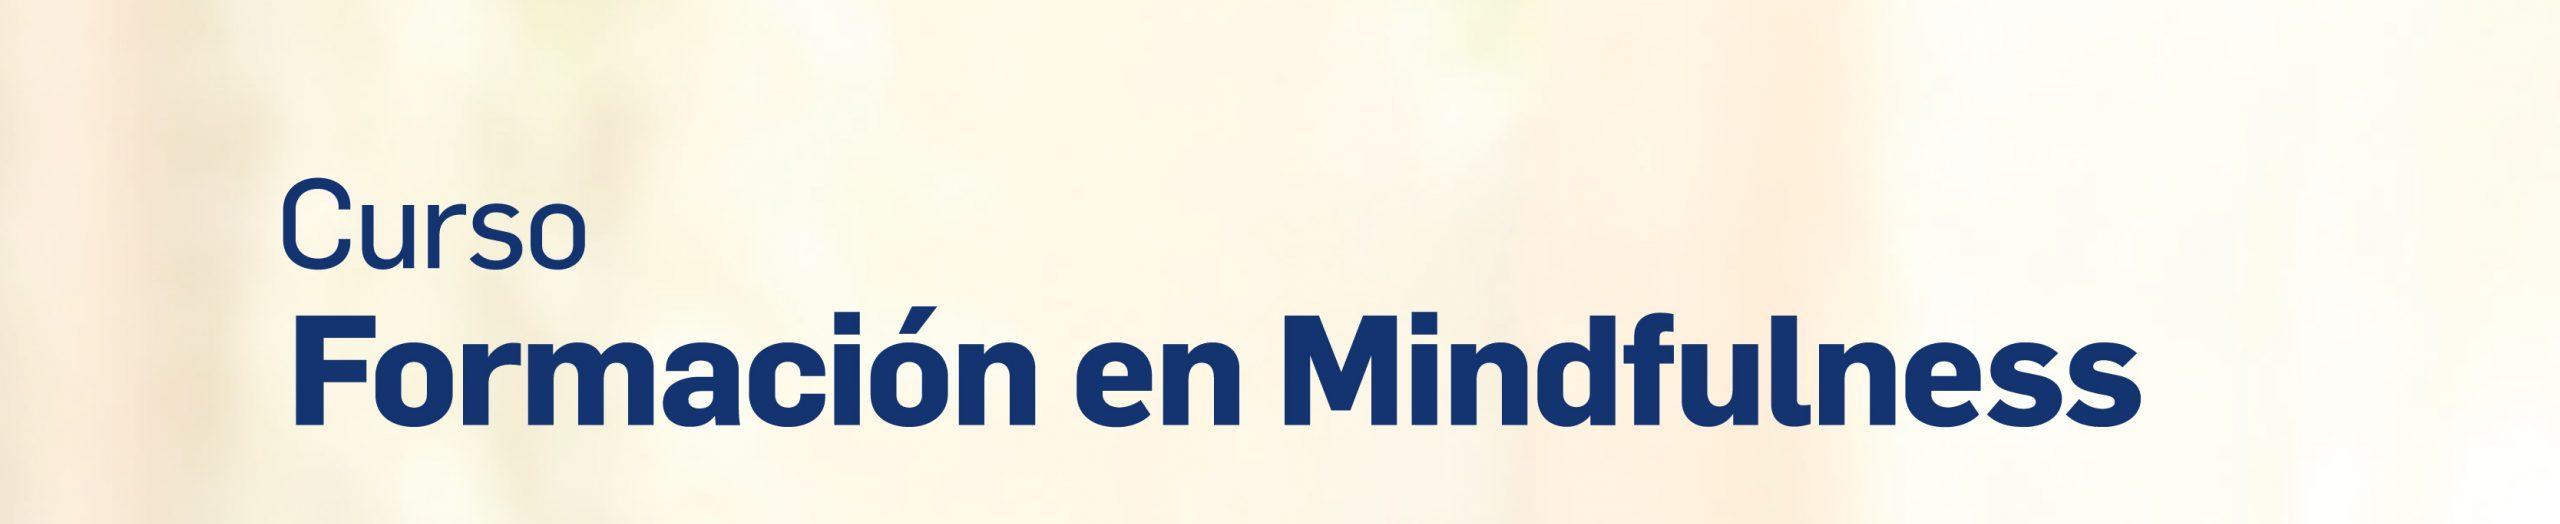 Formación en Mindfulness